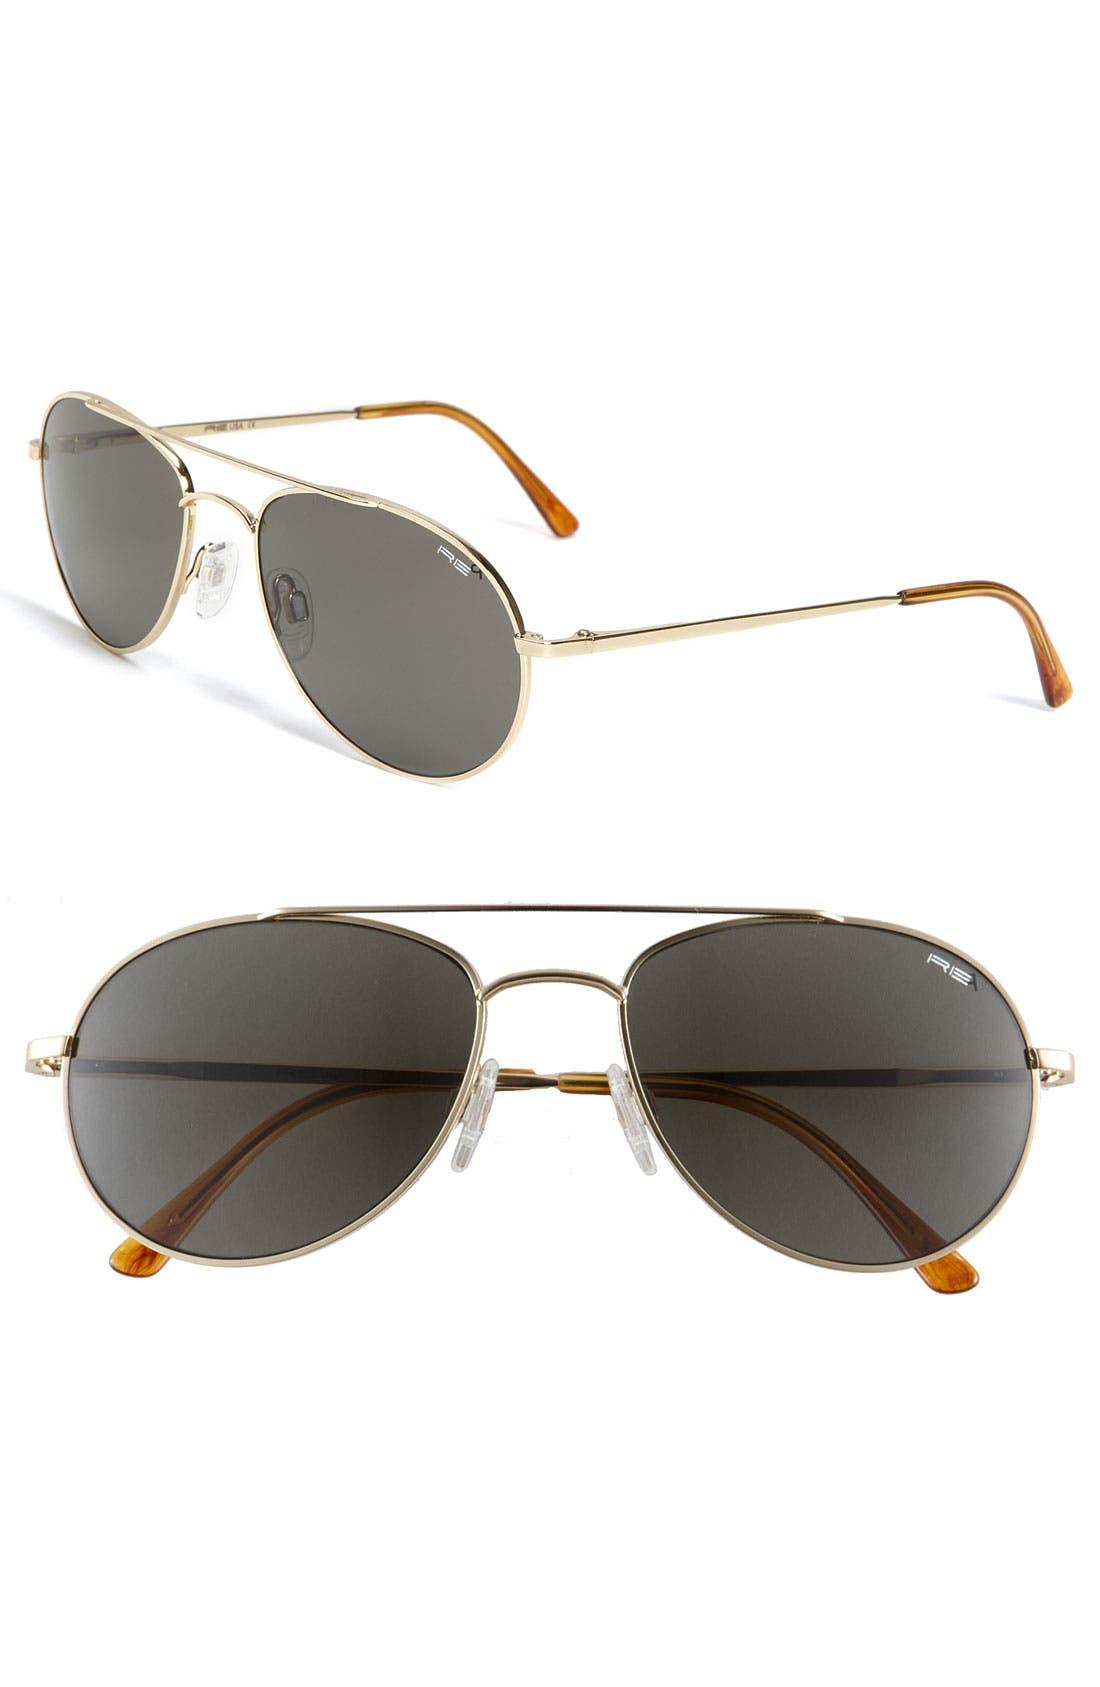 'Crew Chief' 54mm Polarized Sunglasses, Main, color, 720